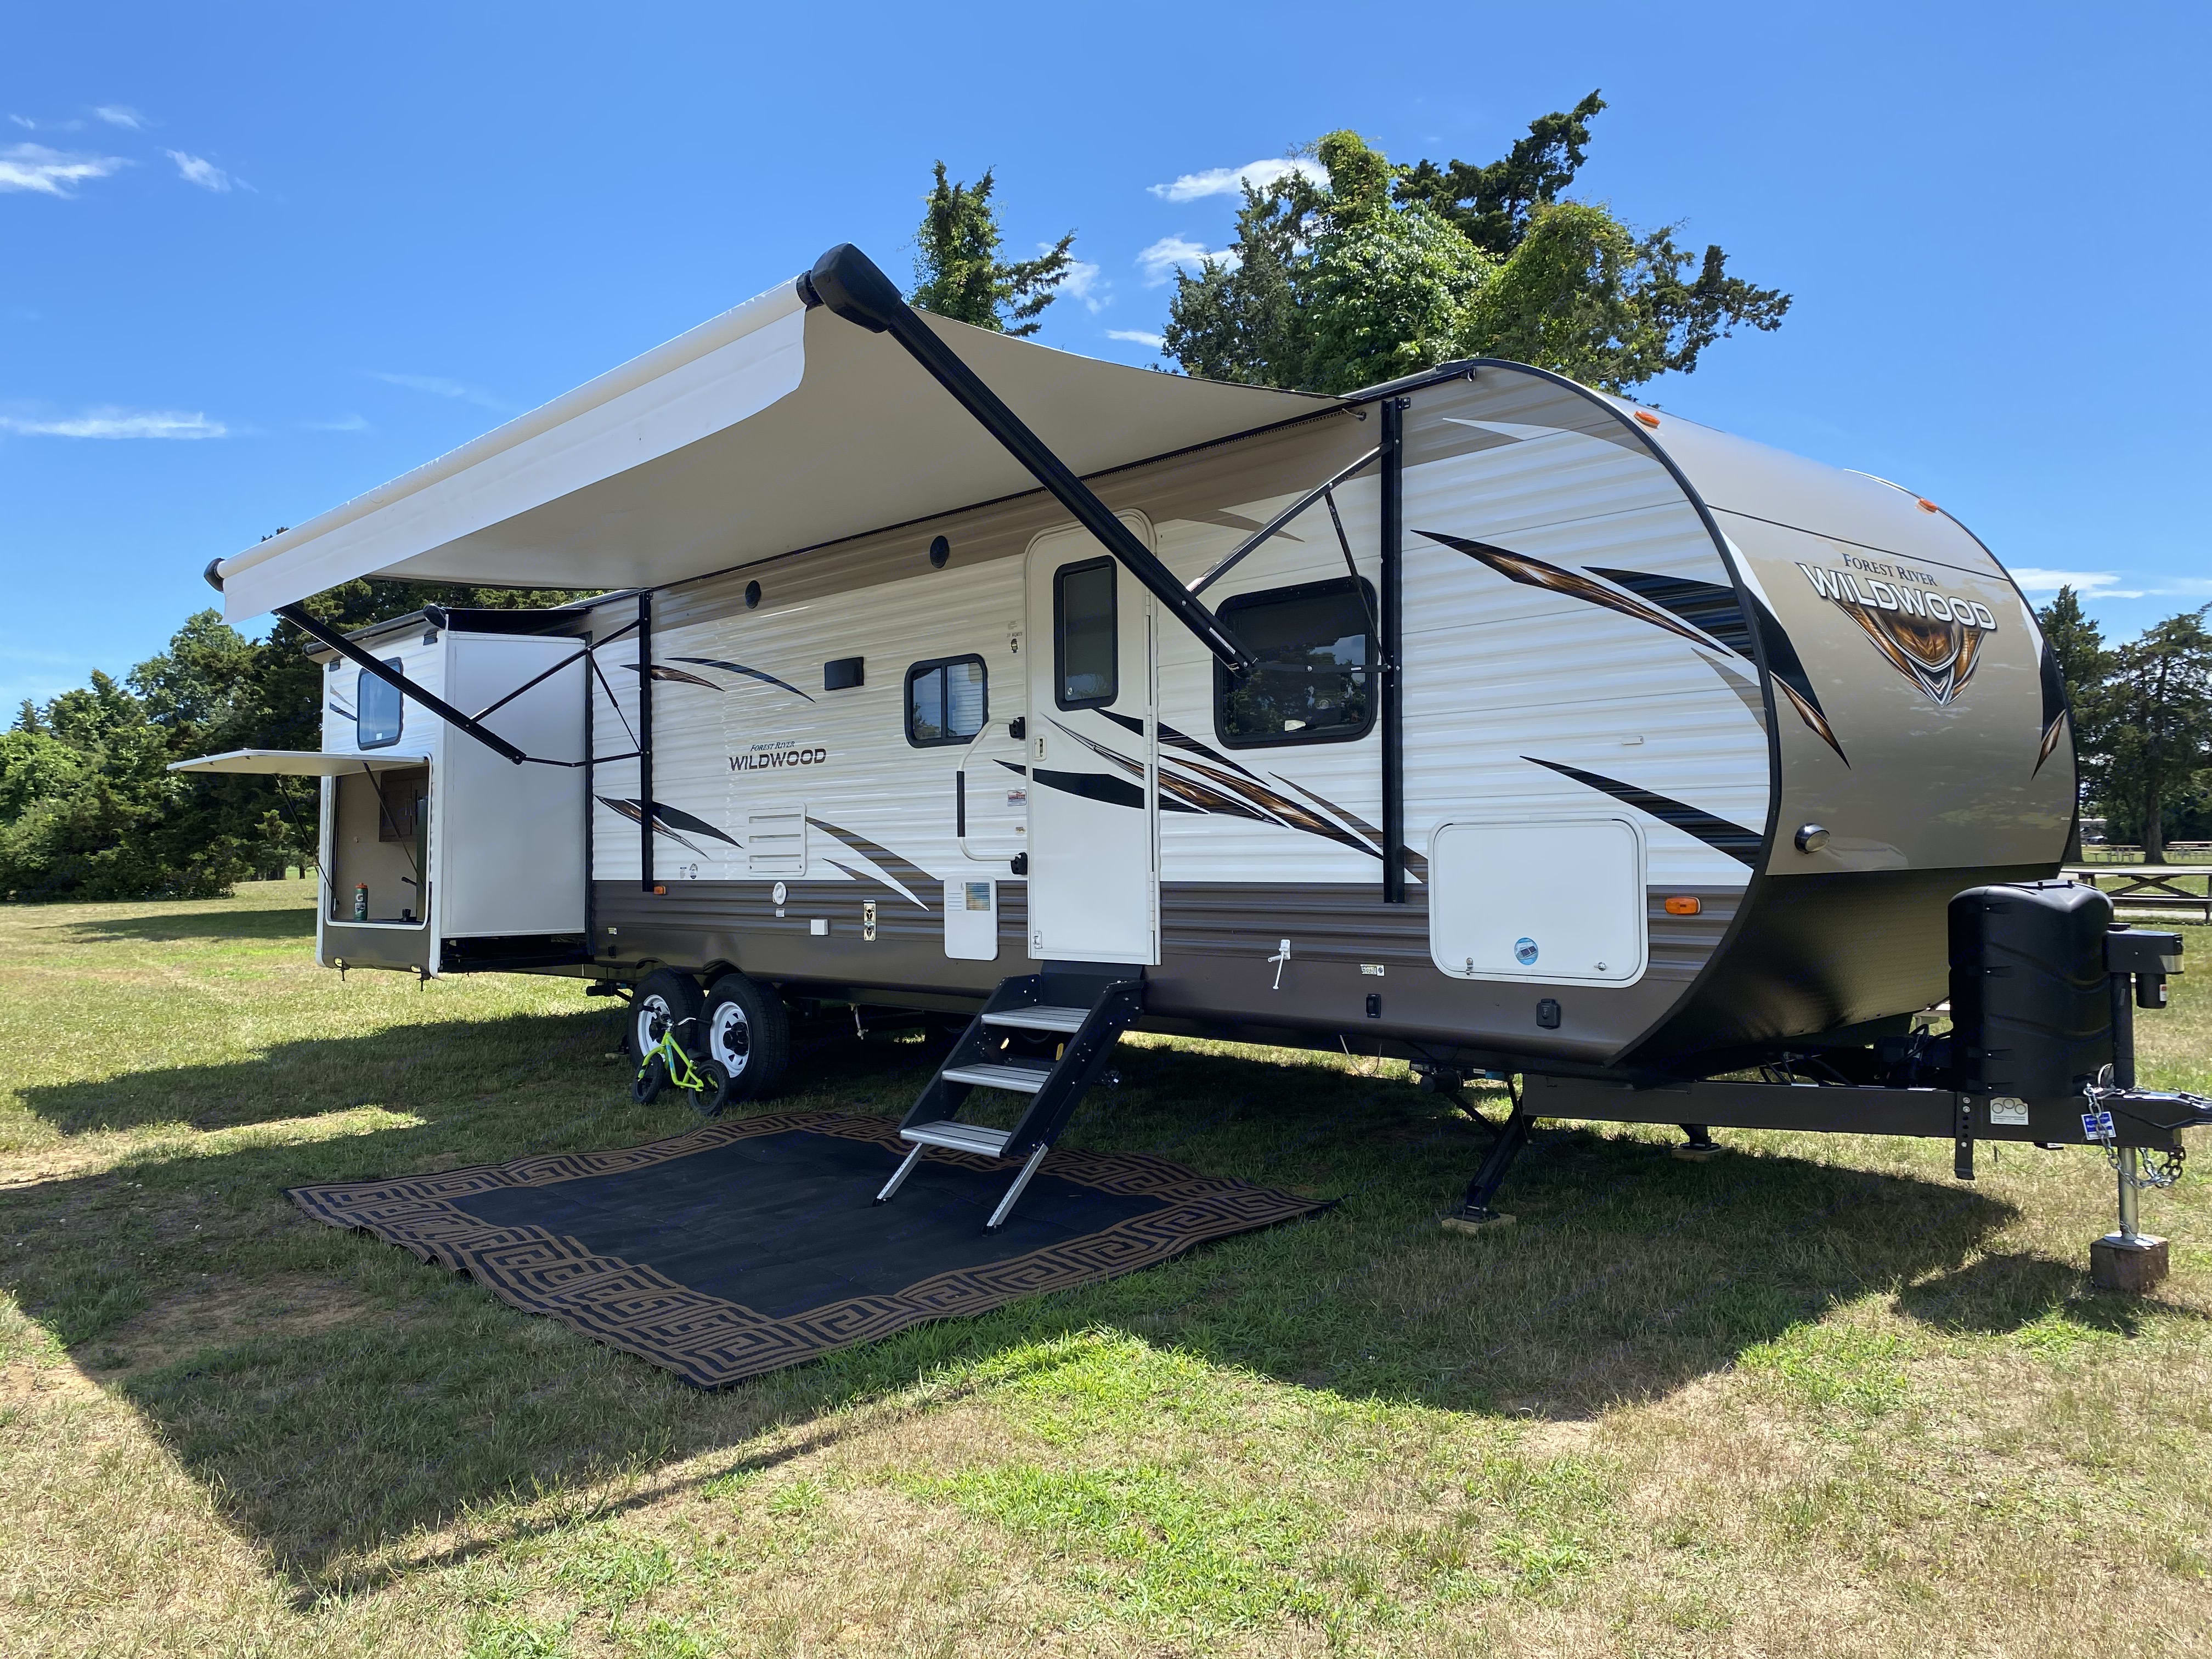 Forest River Wildwood 31 KQBTS 2018